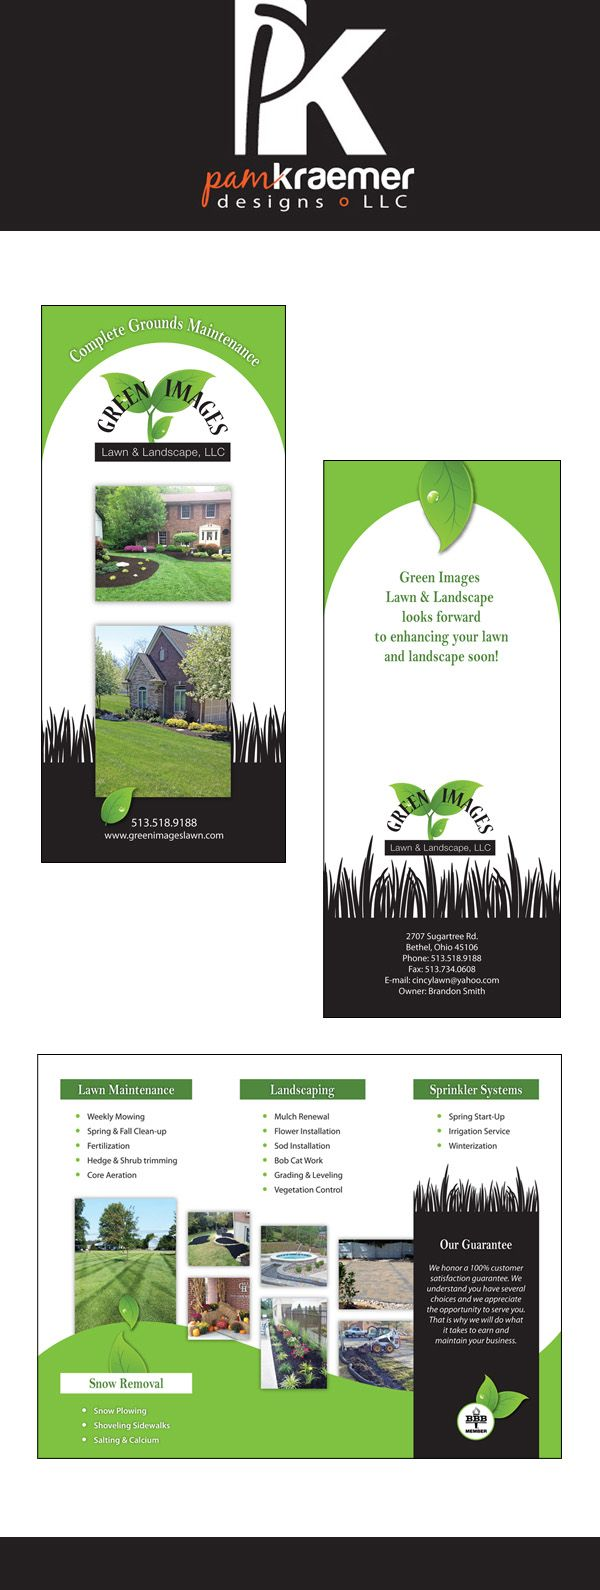 brochure design for a lawn and landscape company